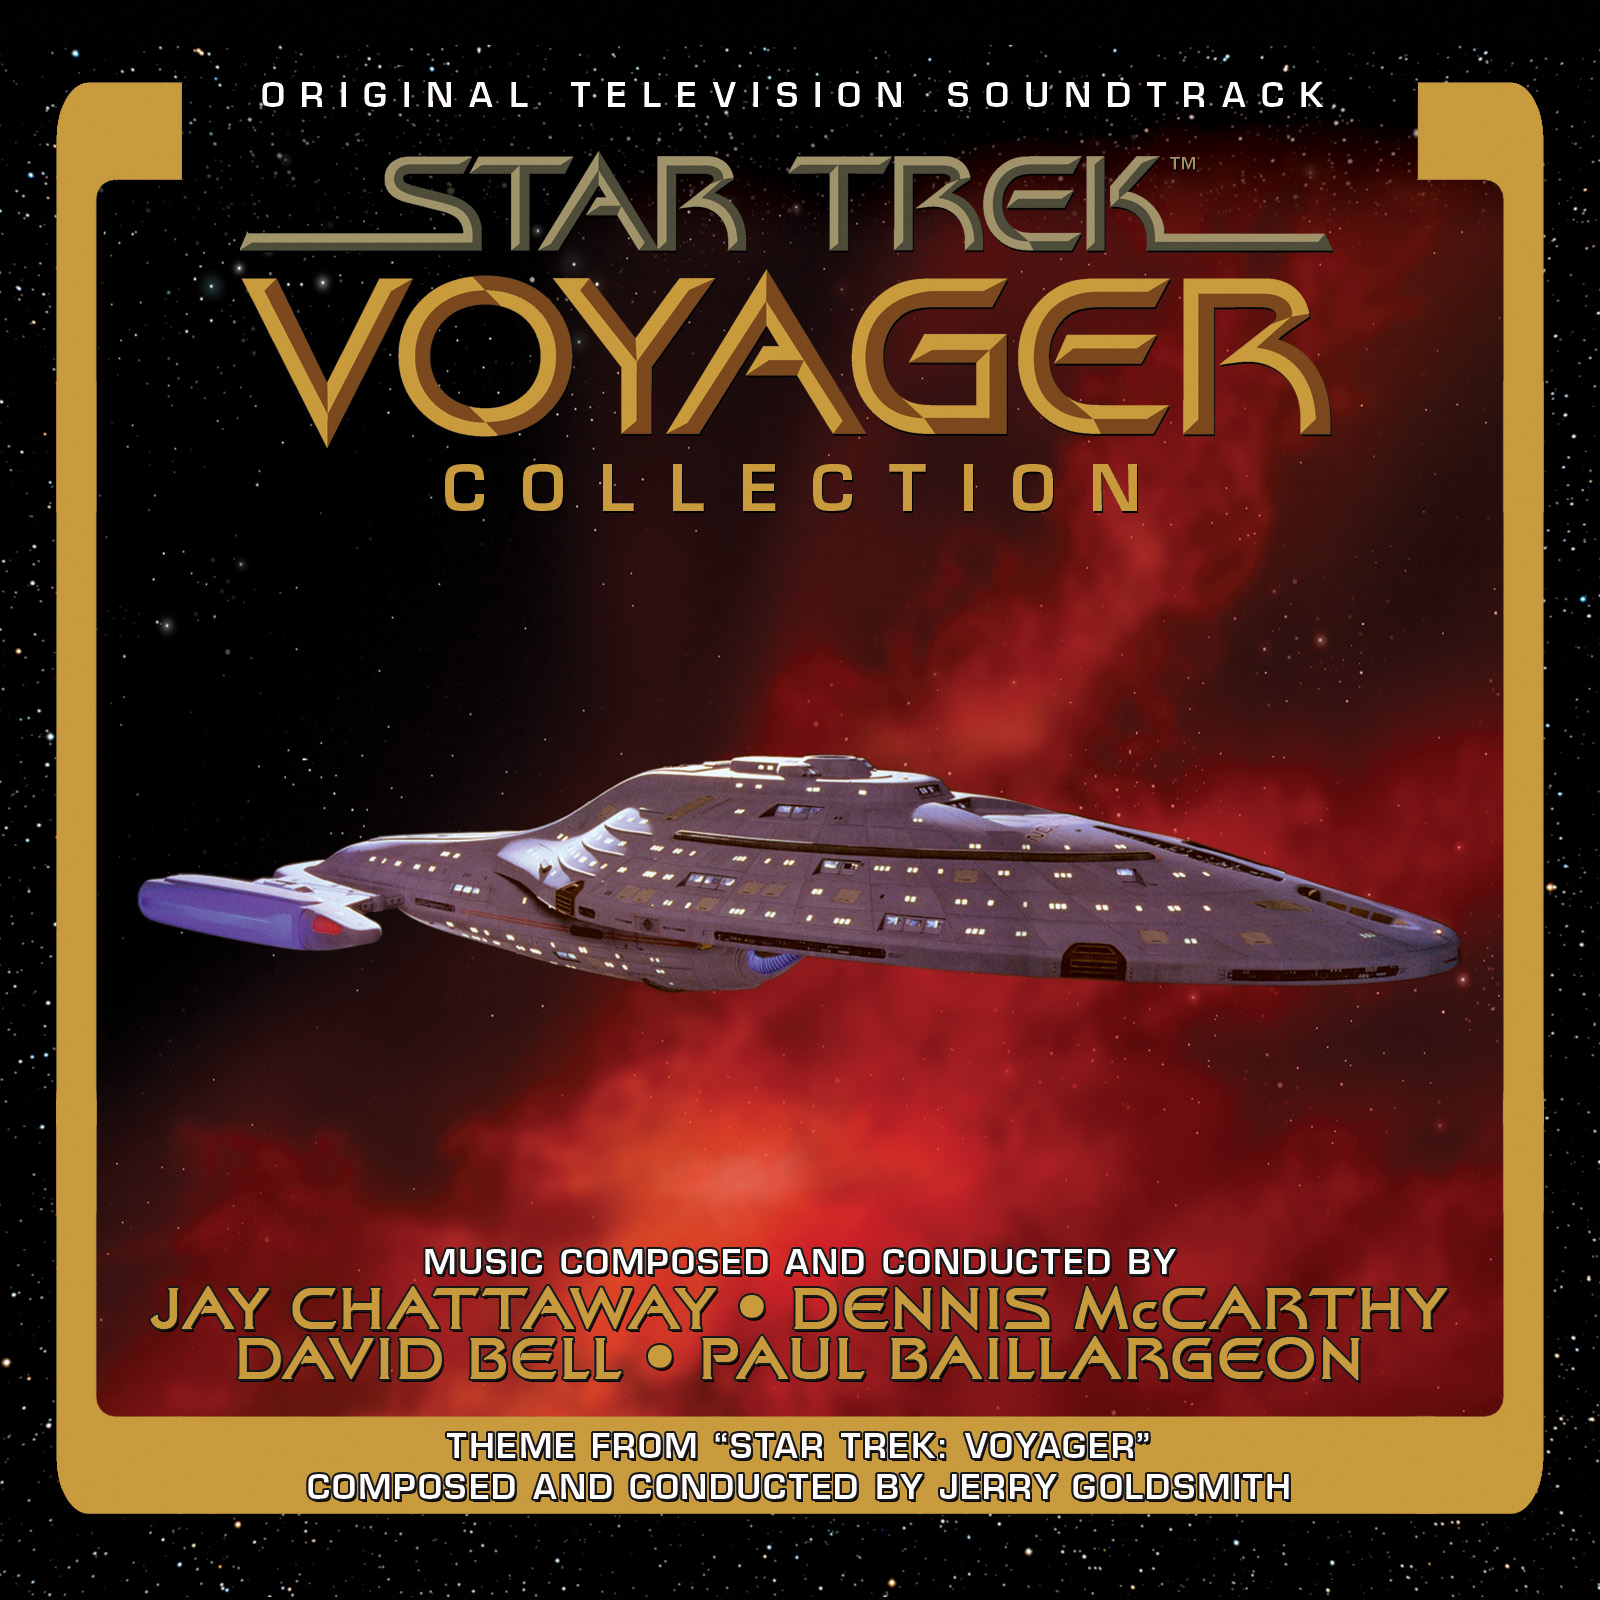 Star Trek: Voyager Collection